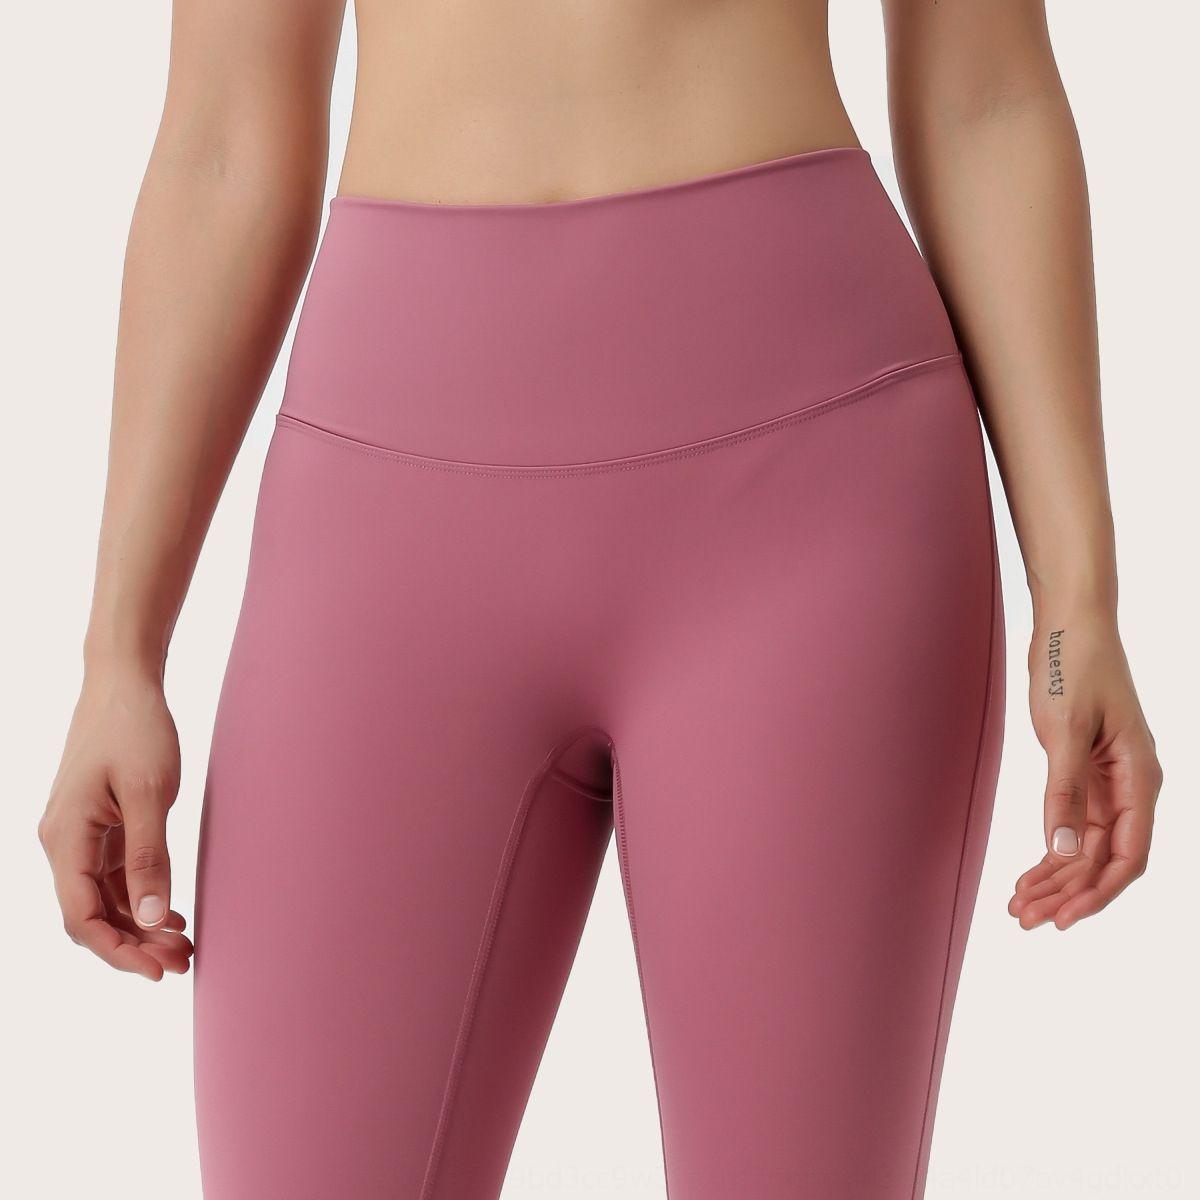 quEdW İnternet ünlü fitness Şeftali Ağ Ünlü pantolon spor yoga yüksek bel streç kalça çıplak sıkı kalça kaldırma ins pa çift taraflı